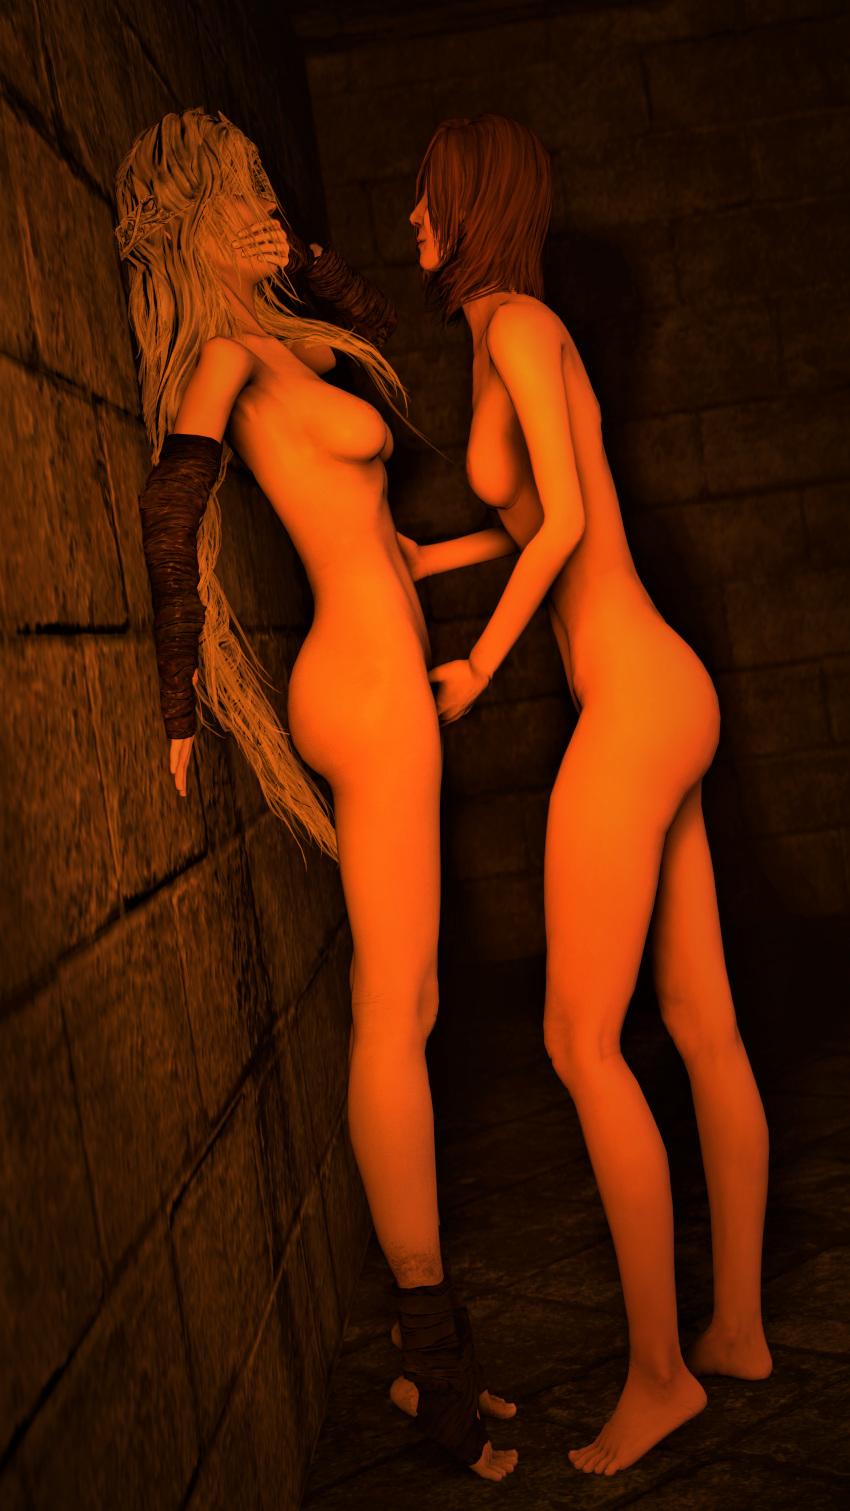 astora dark souls andre of Arania kamiki net tf_main htm